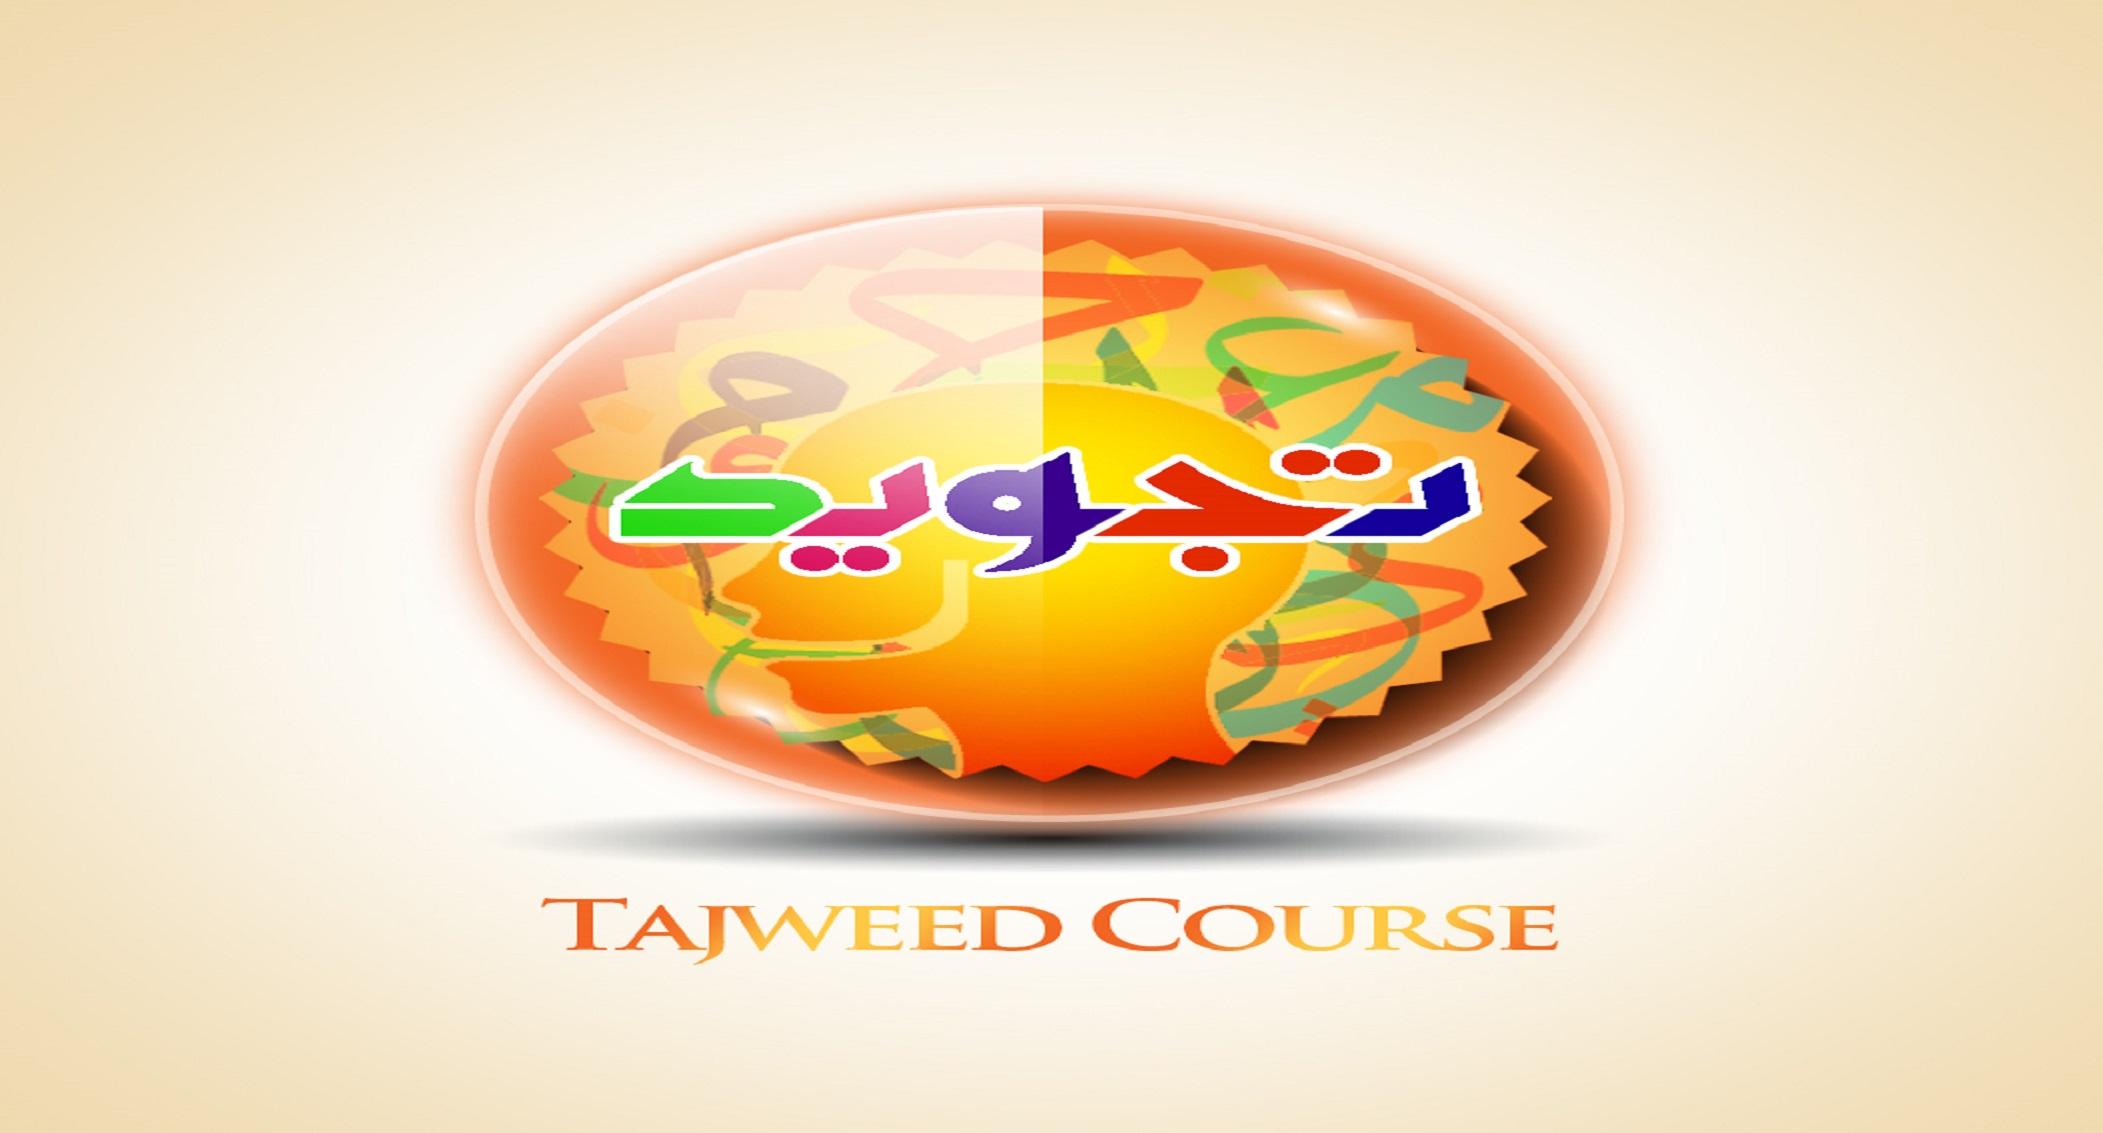 3-Months Short Tajweed Course